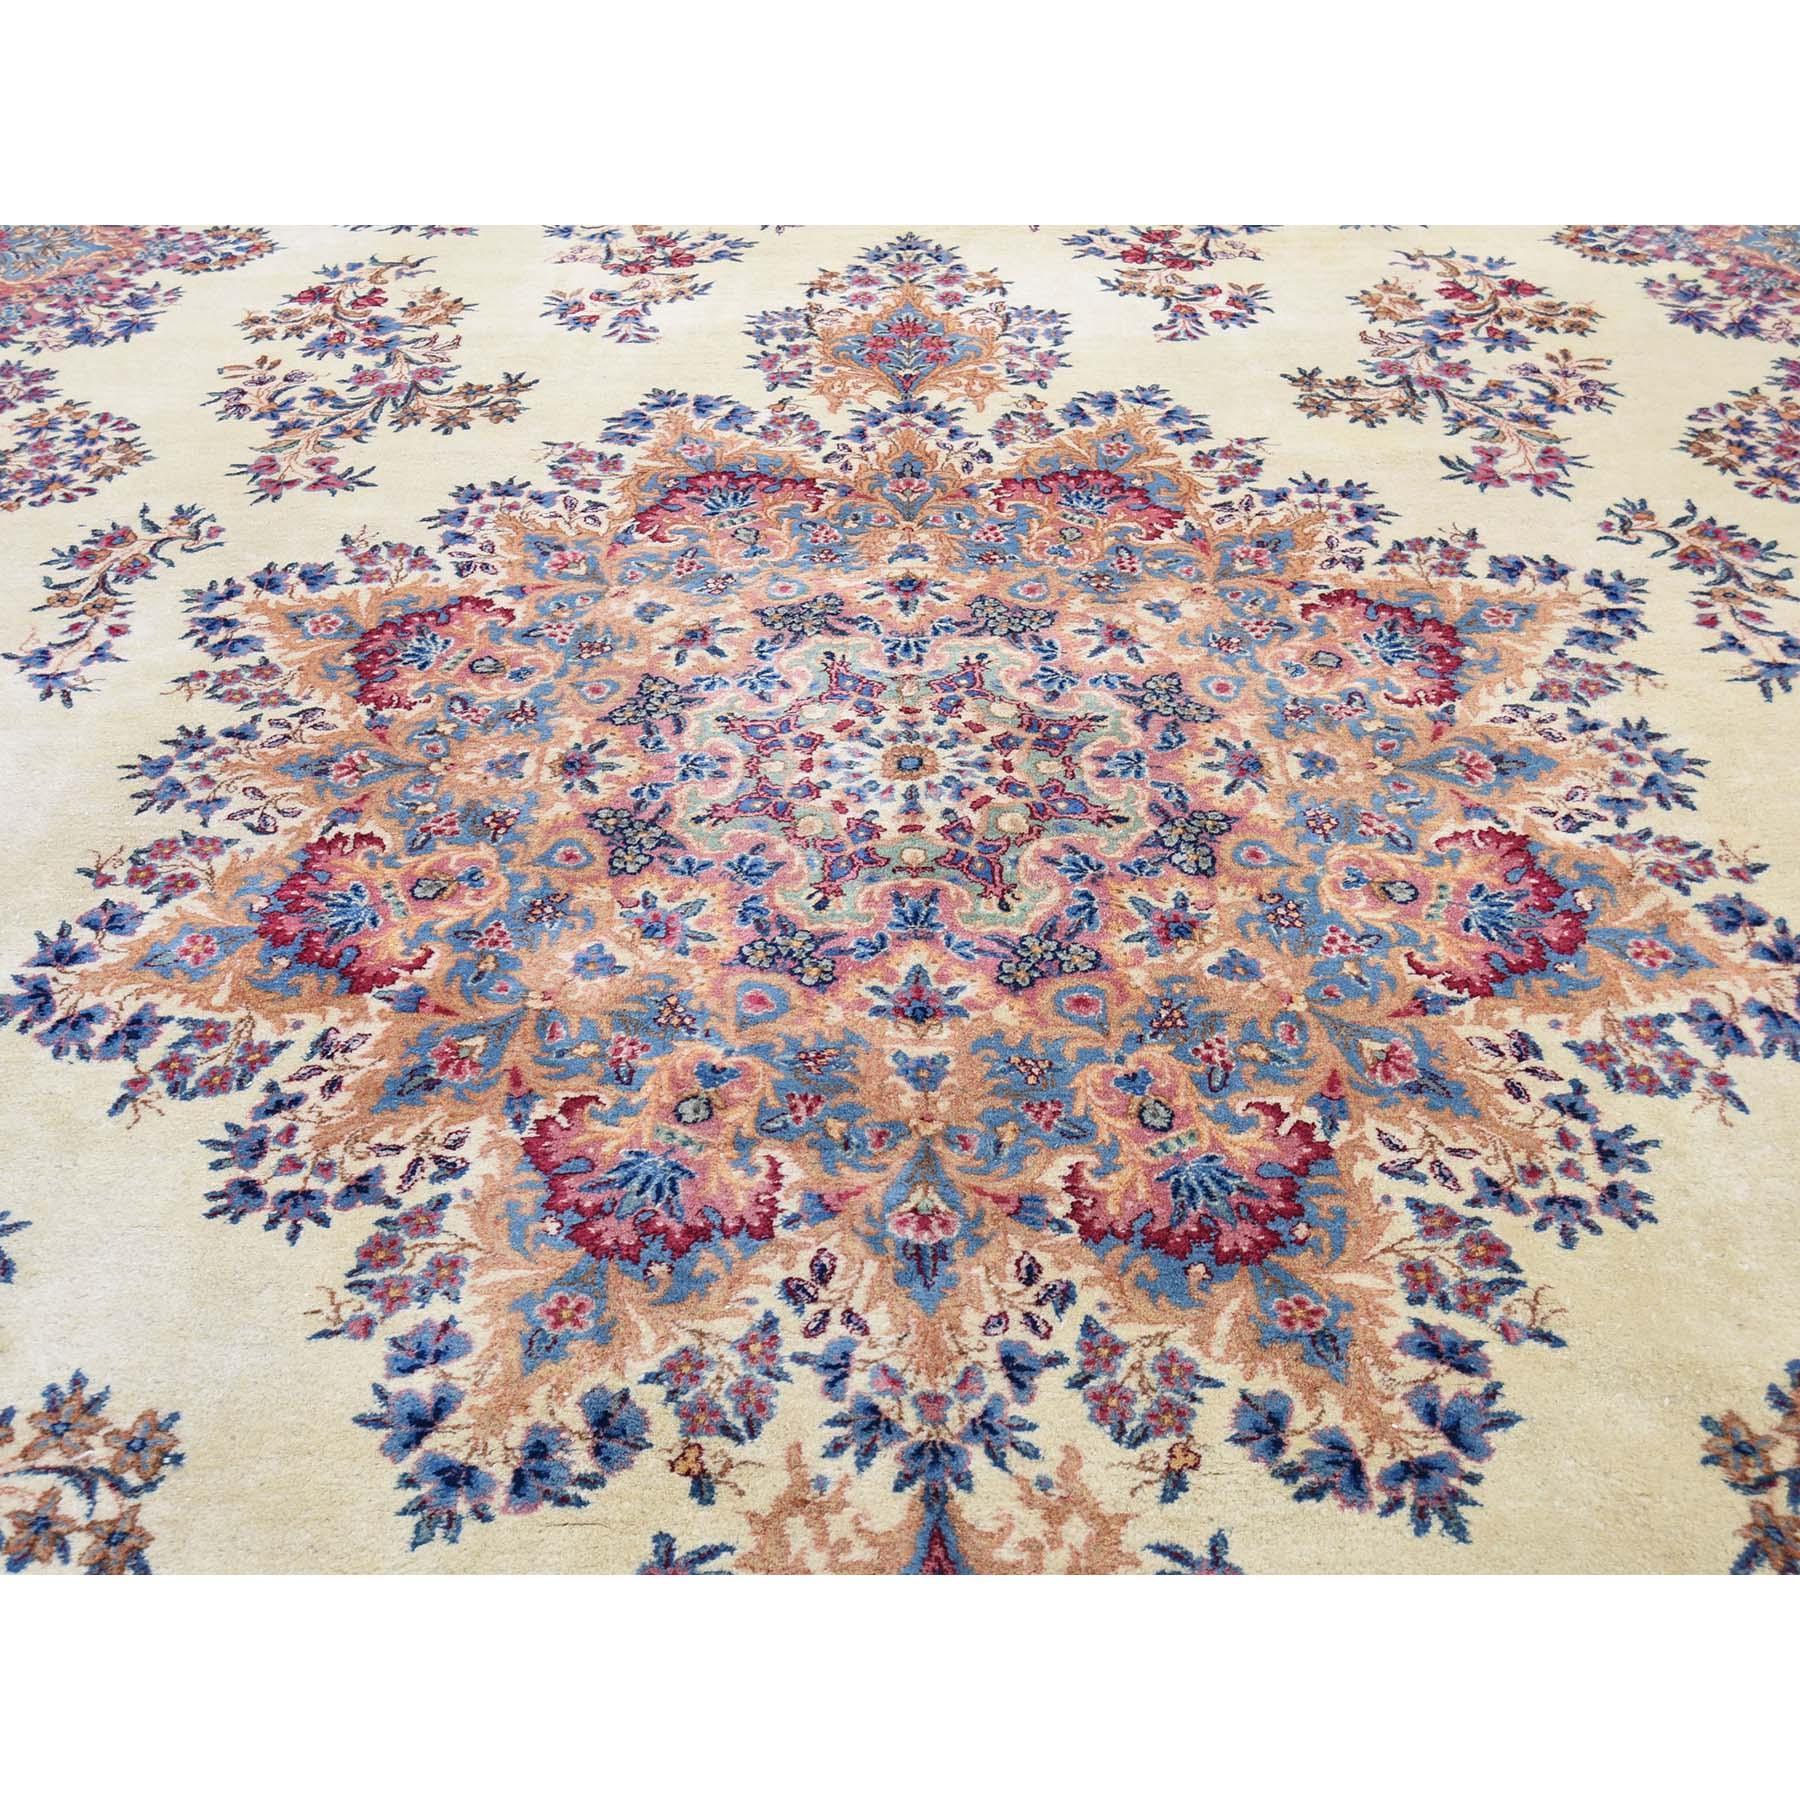 11-4 x16-9  Semi Antique Persian Kerman Mint Condition Full Pile Soft Oversize Oriental Rug